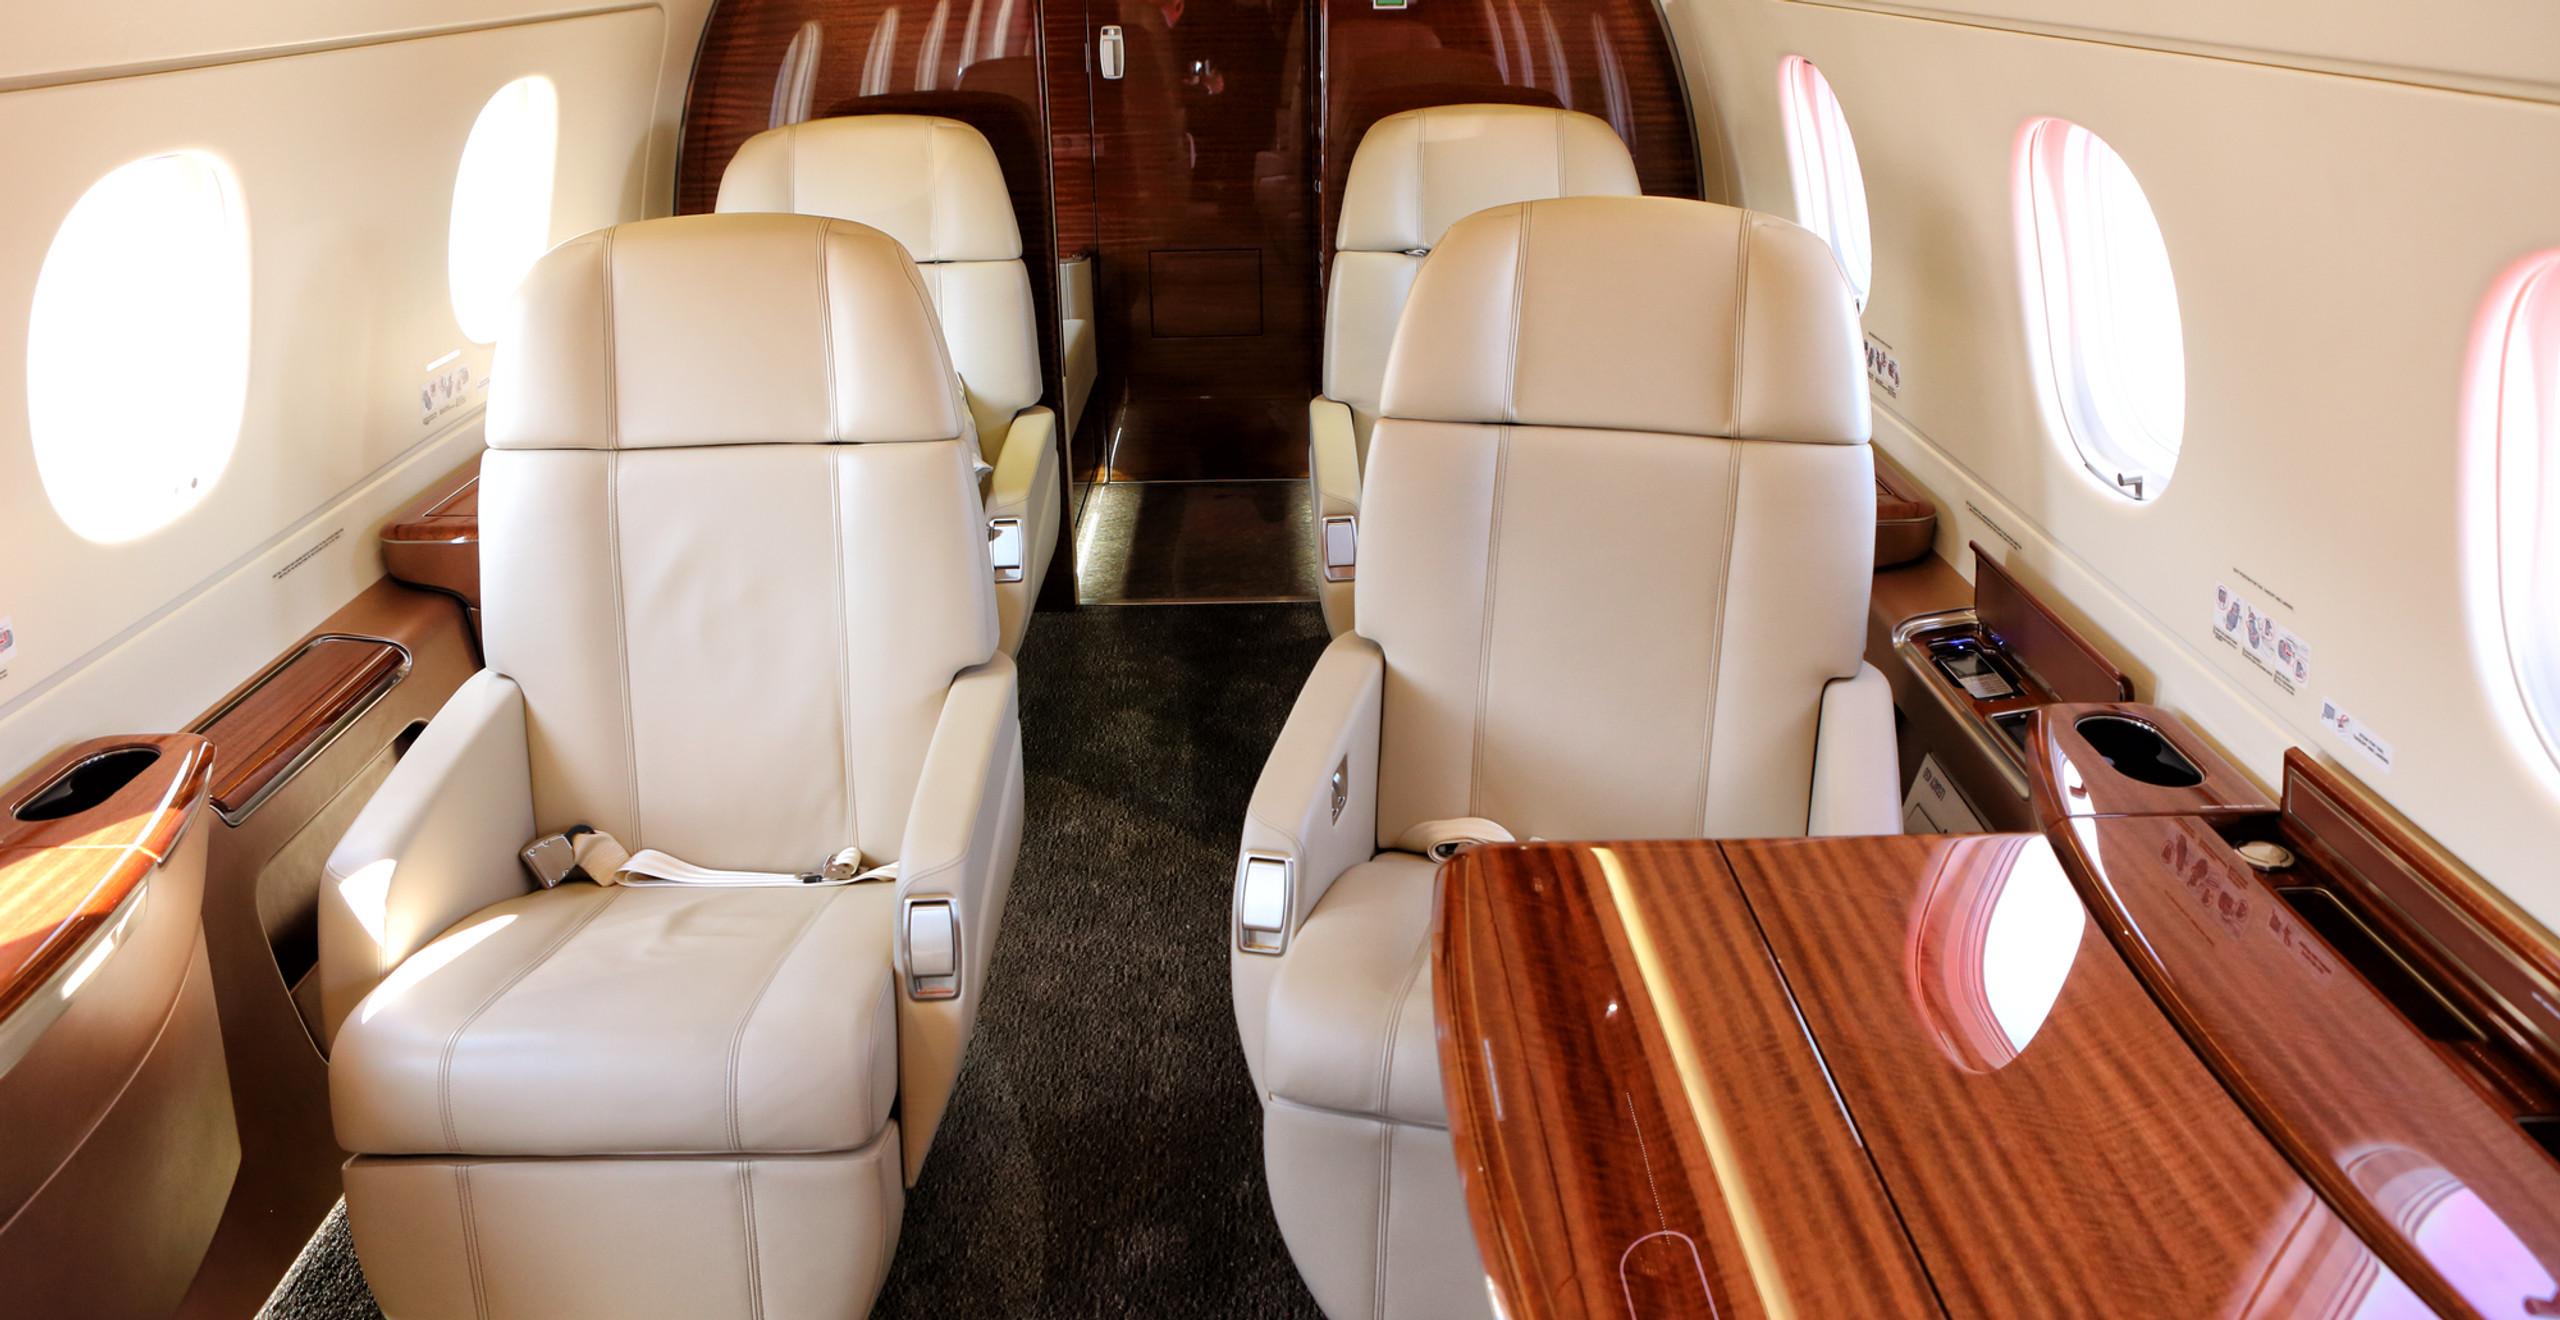 Mid-Sized Jet - Interior